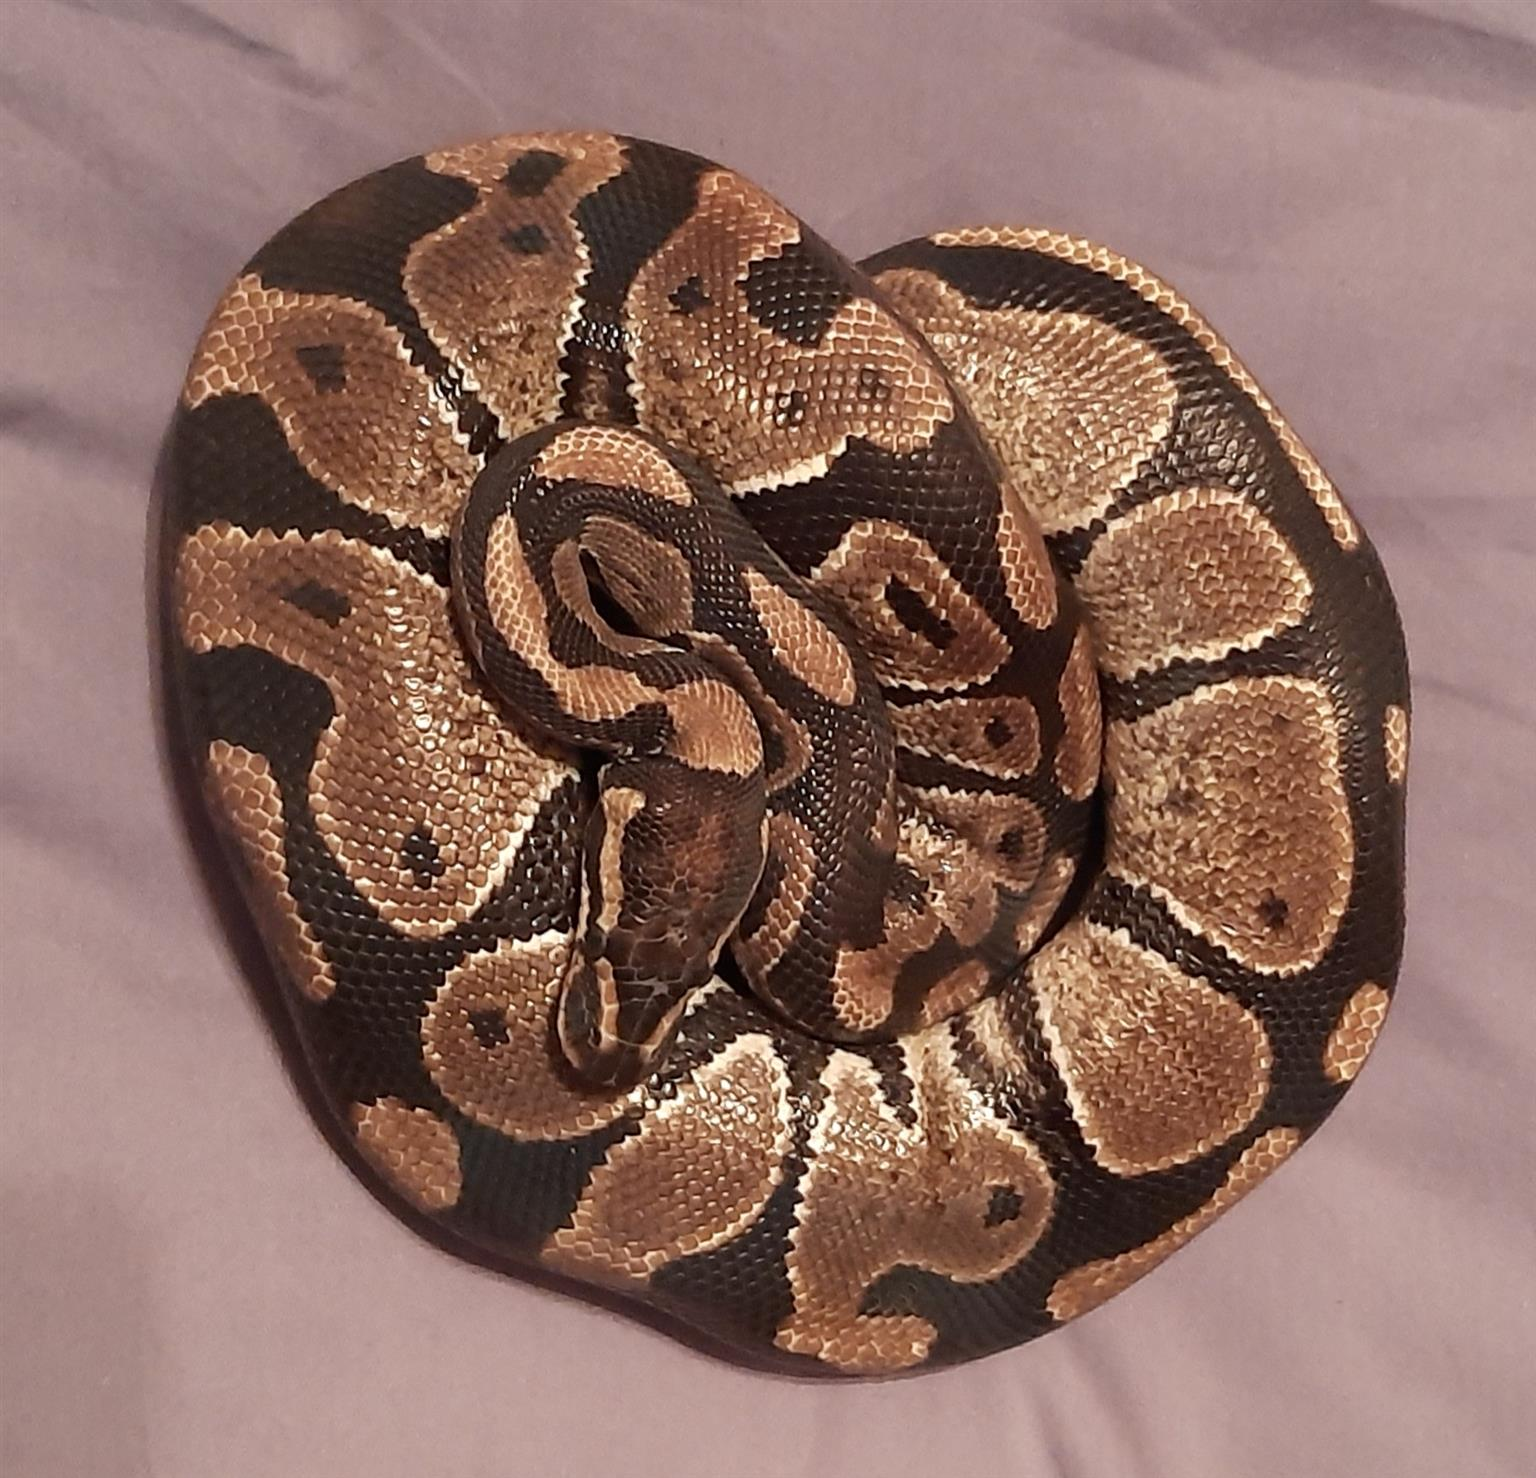 Ball python pair for sale